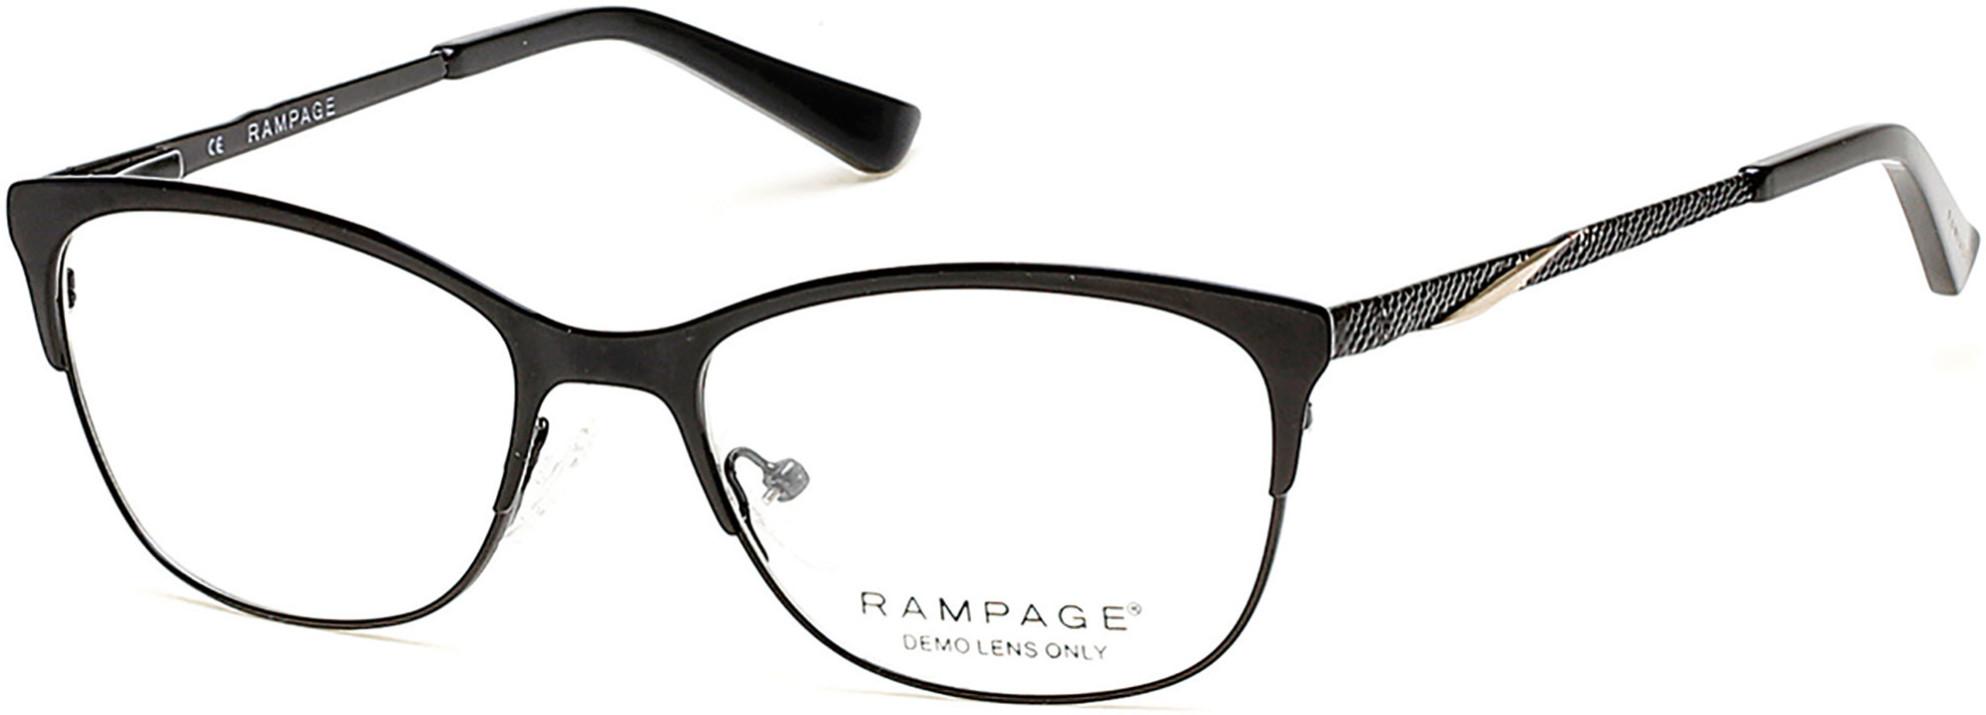 RAMPAGE RA0196 style-color 001 - Shiny Black